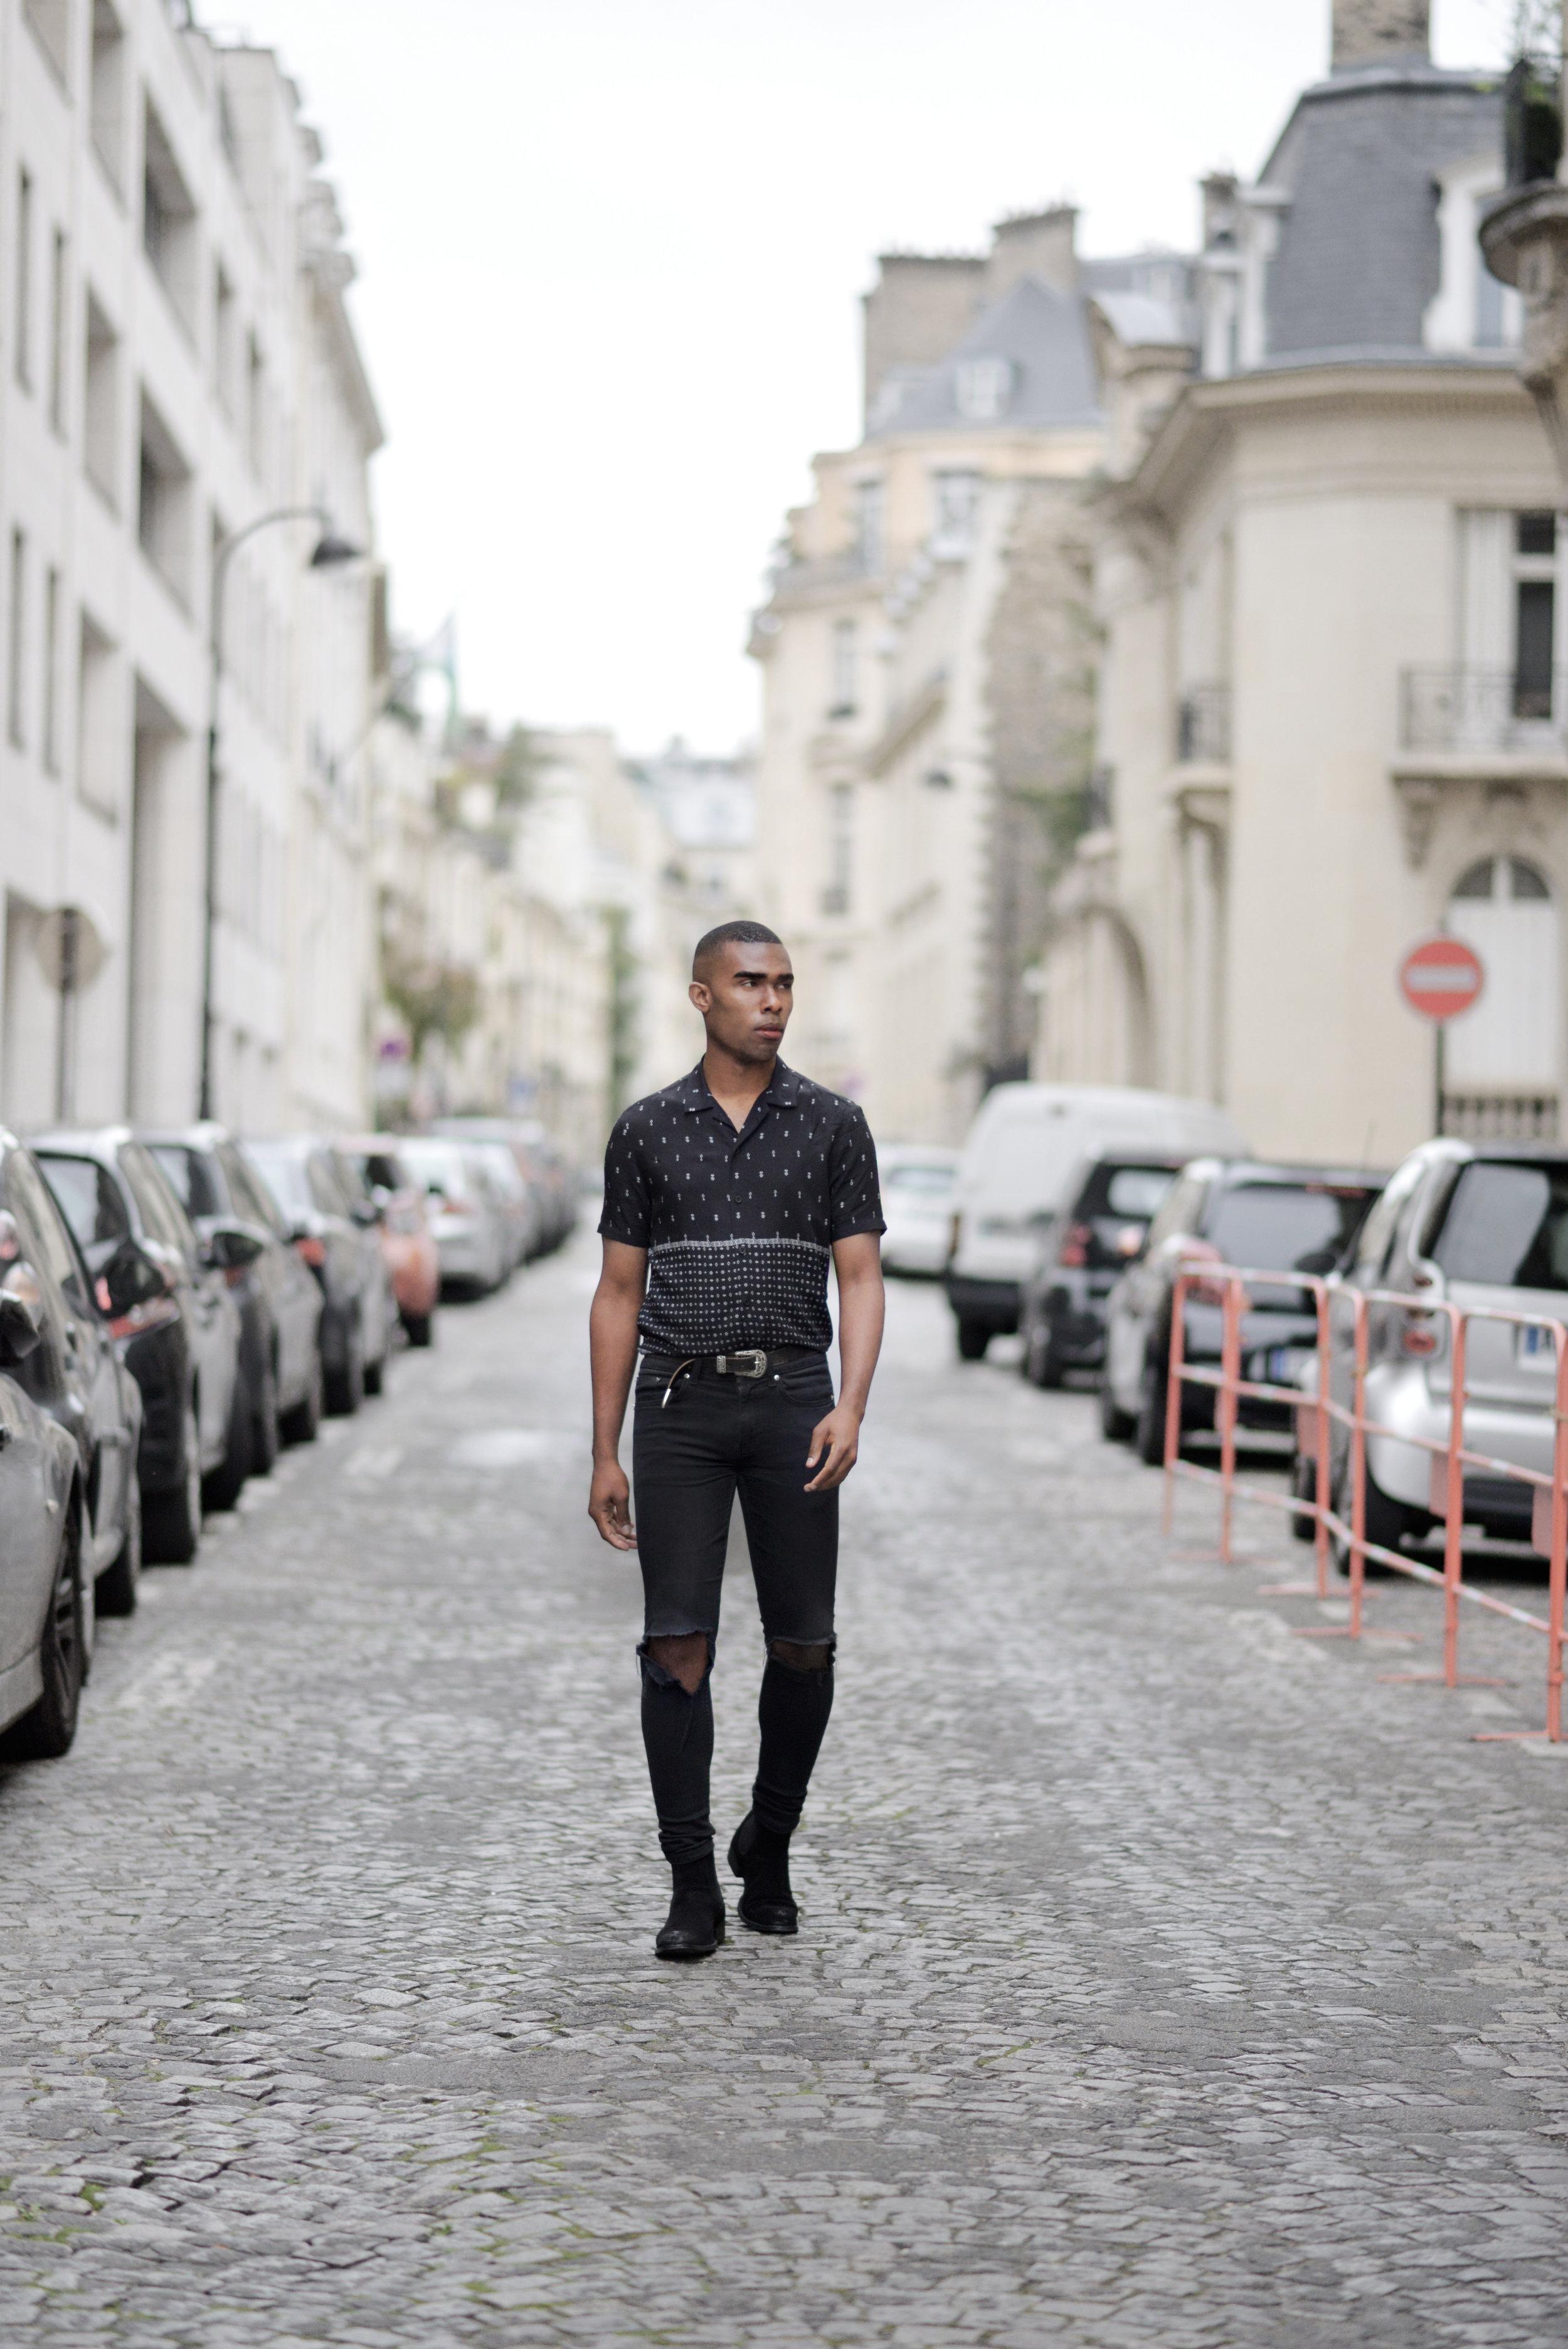 The-Look-Principle-Paris-Fashion-Week-Part2-13.jpg